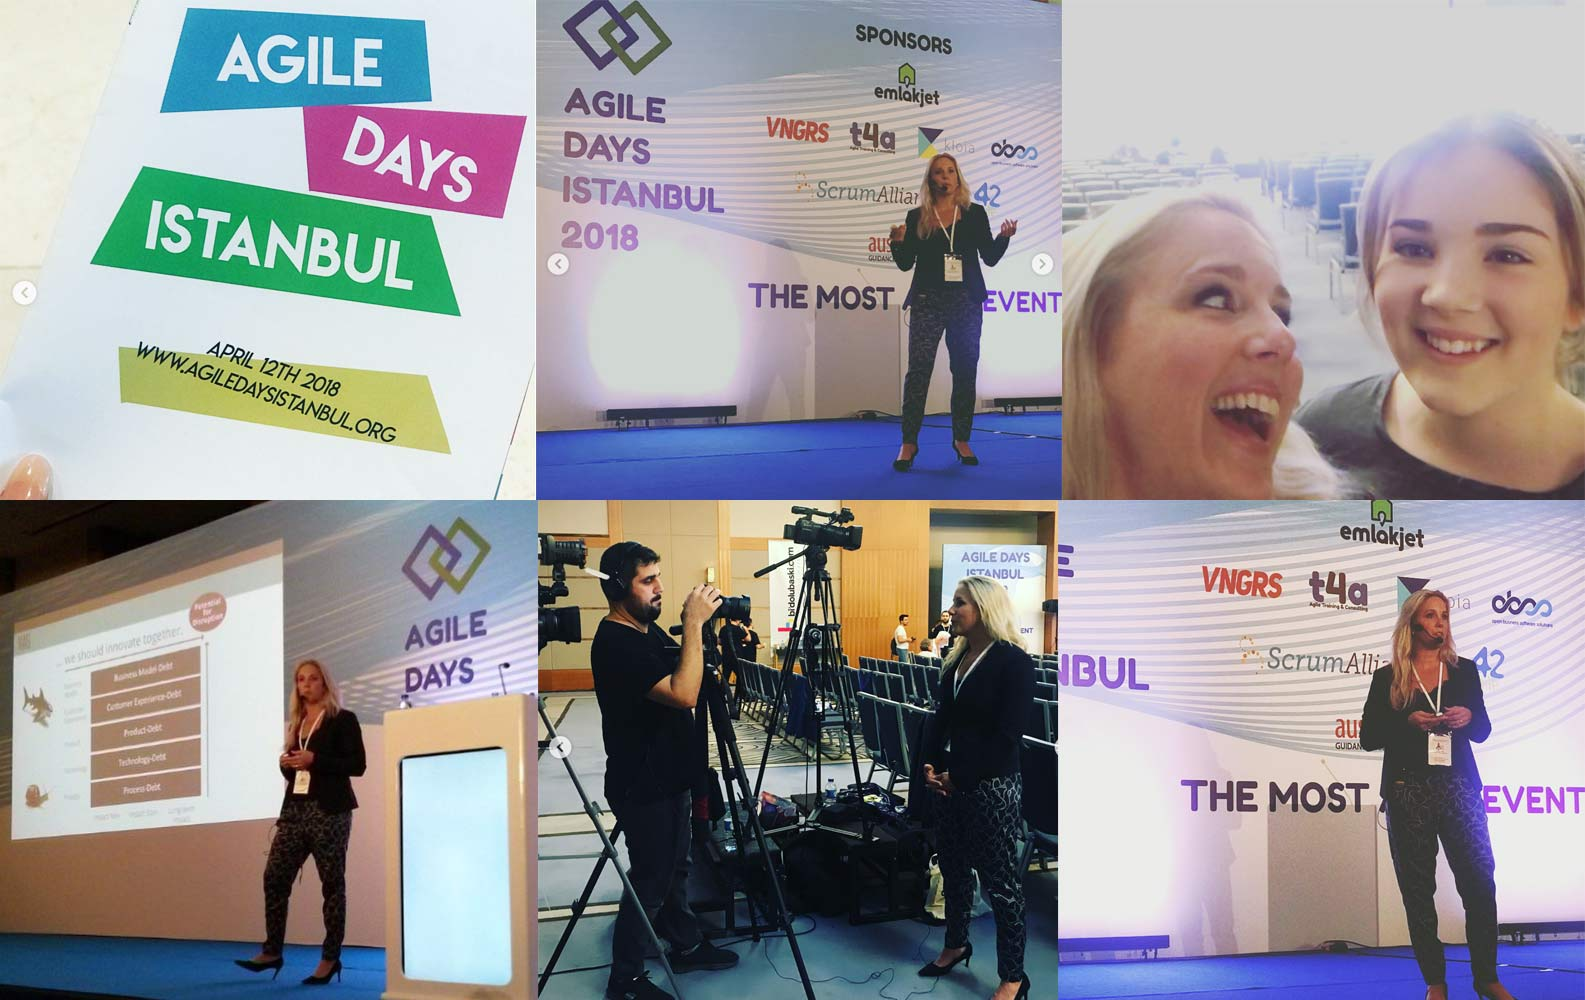 Agile Days Istanbul Presentation